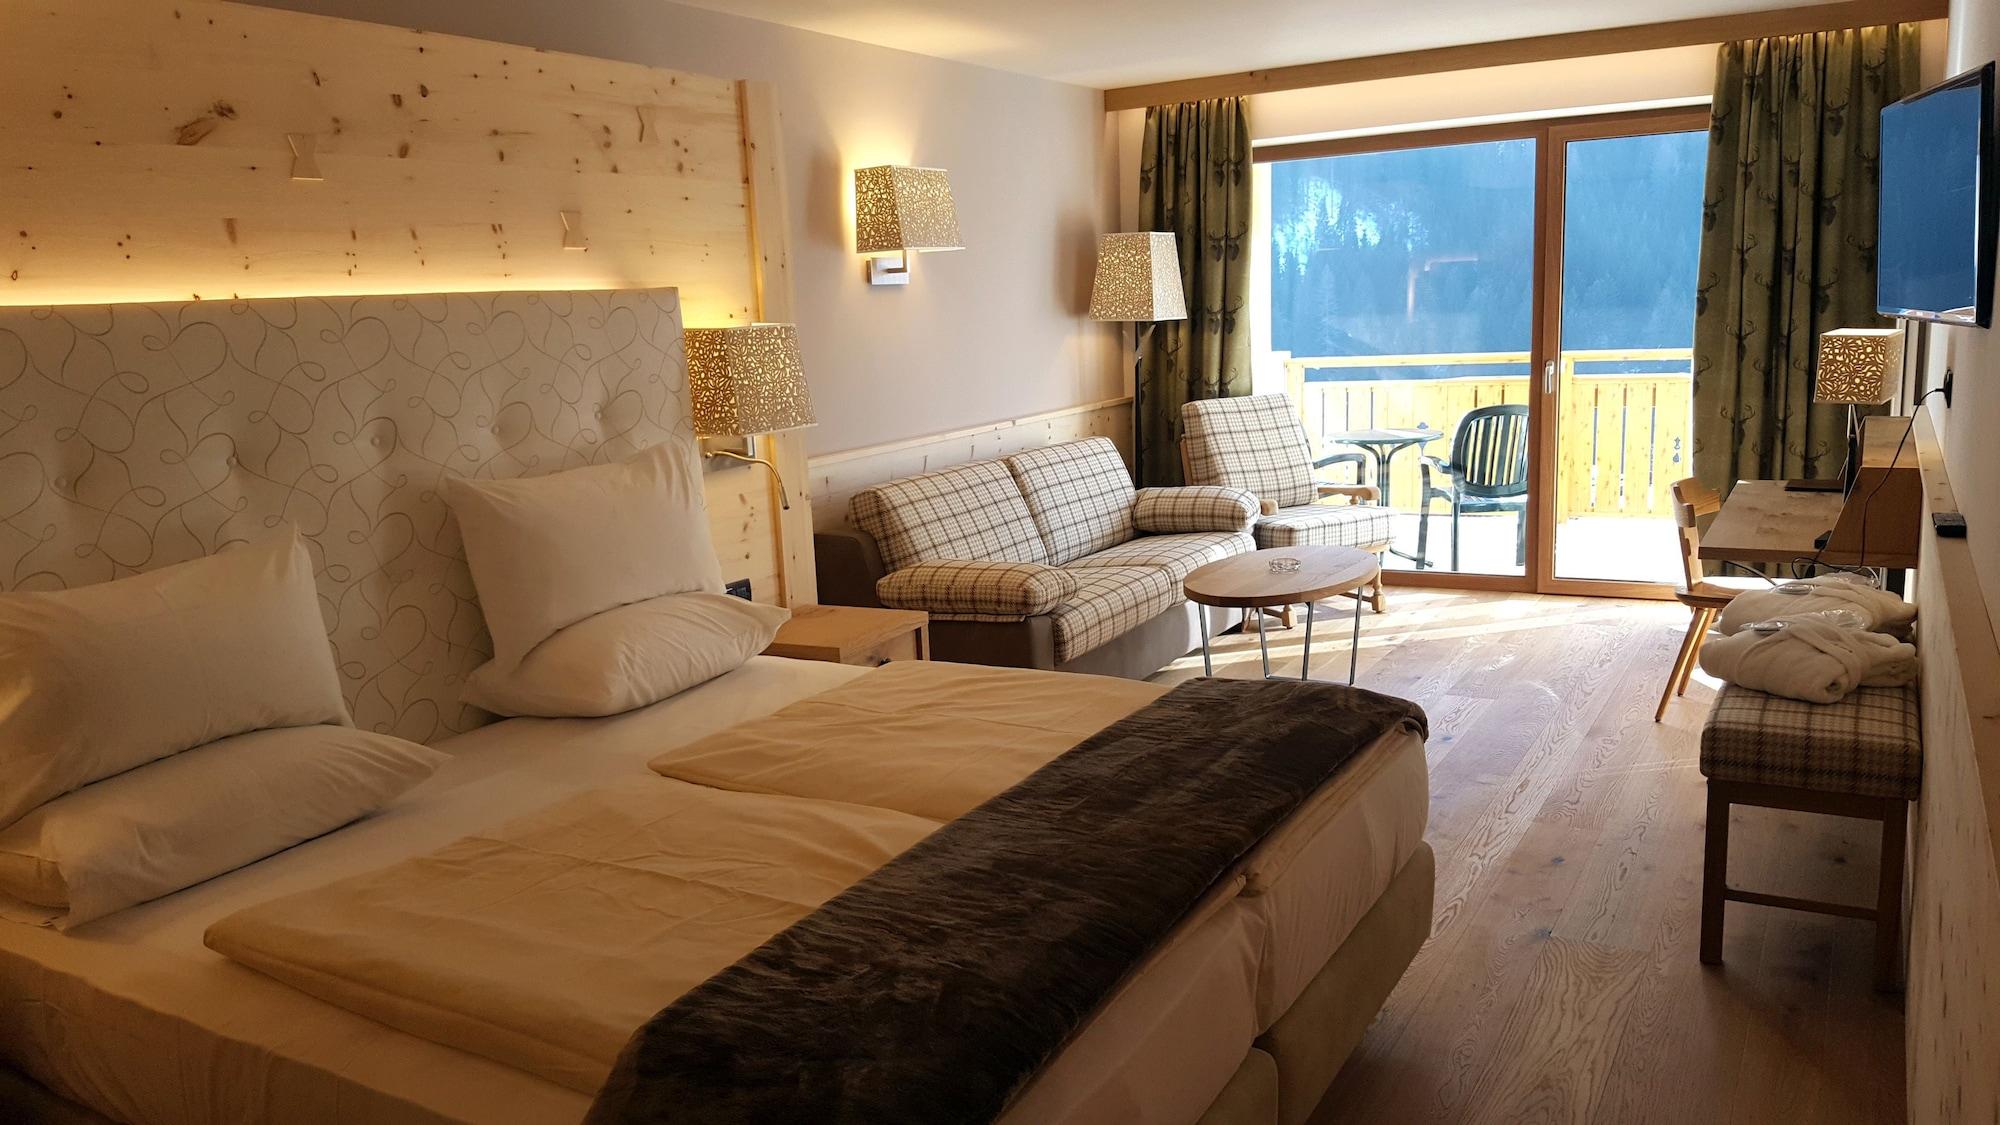 Hotel Cesa Tyrol, Trento